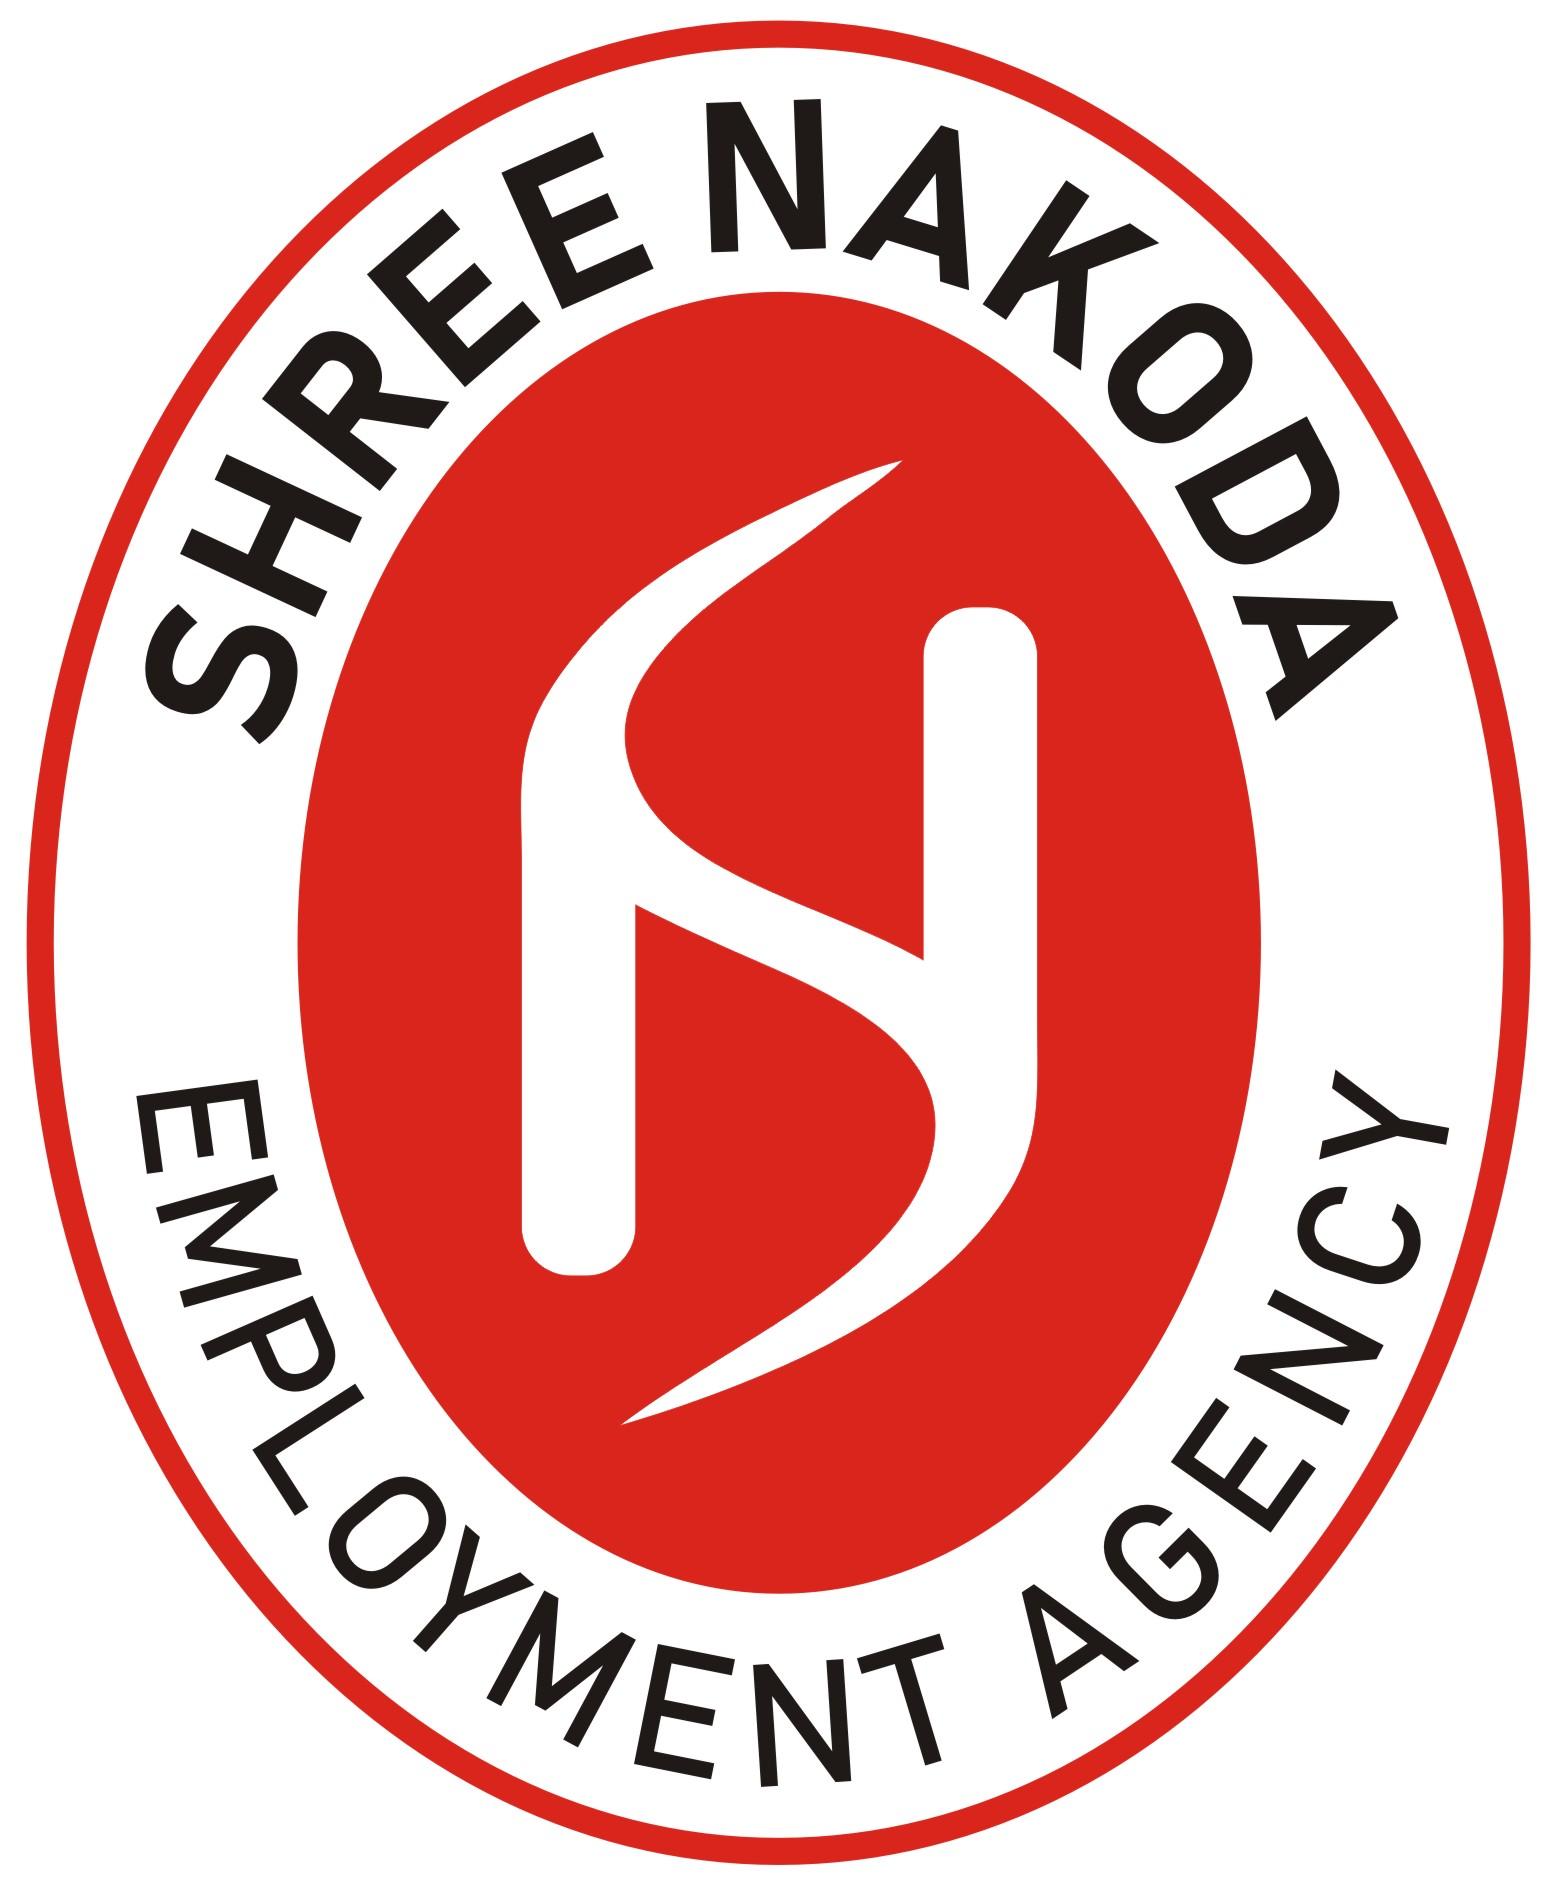 SHREE NAKODA EMPLOYMENT AGENCY